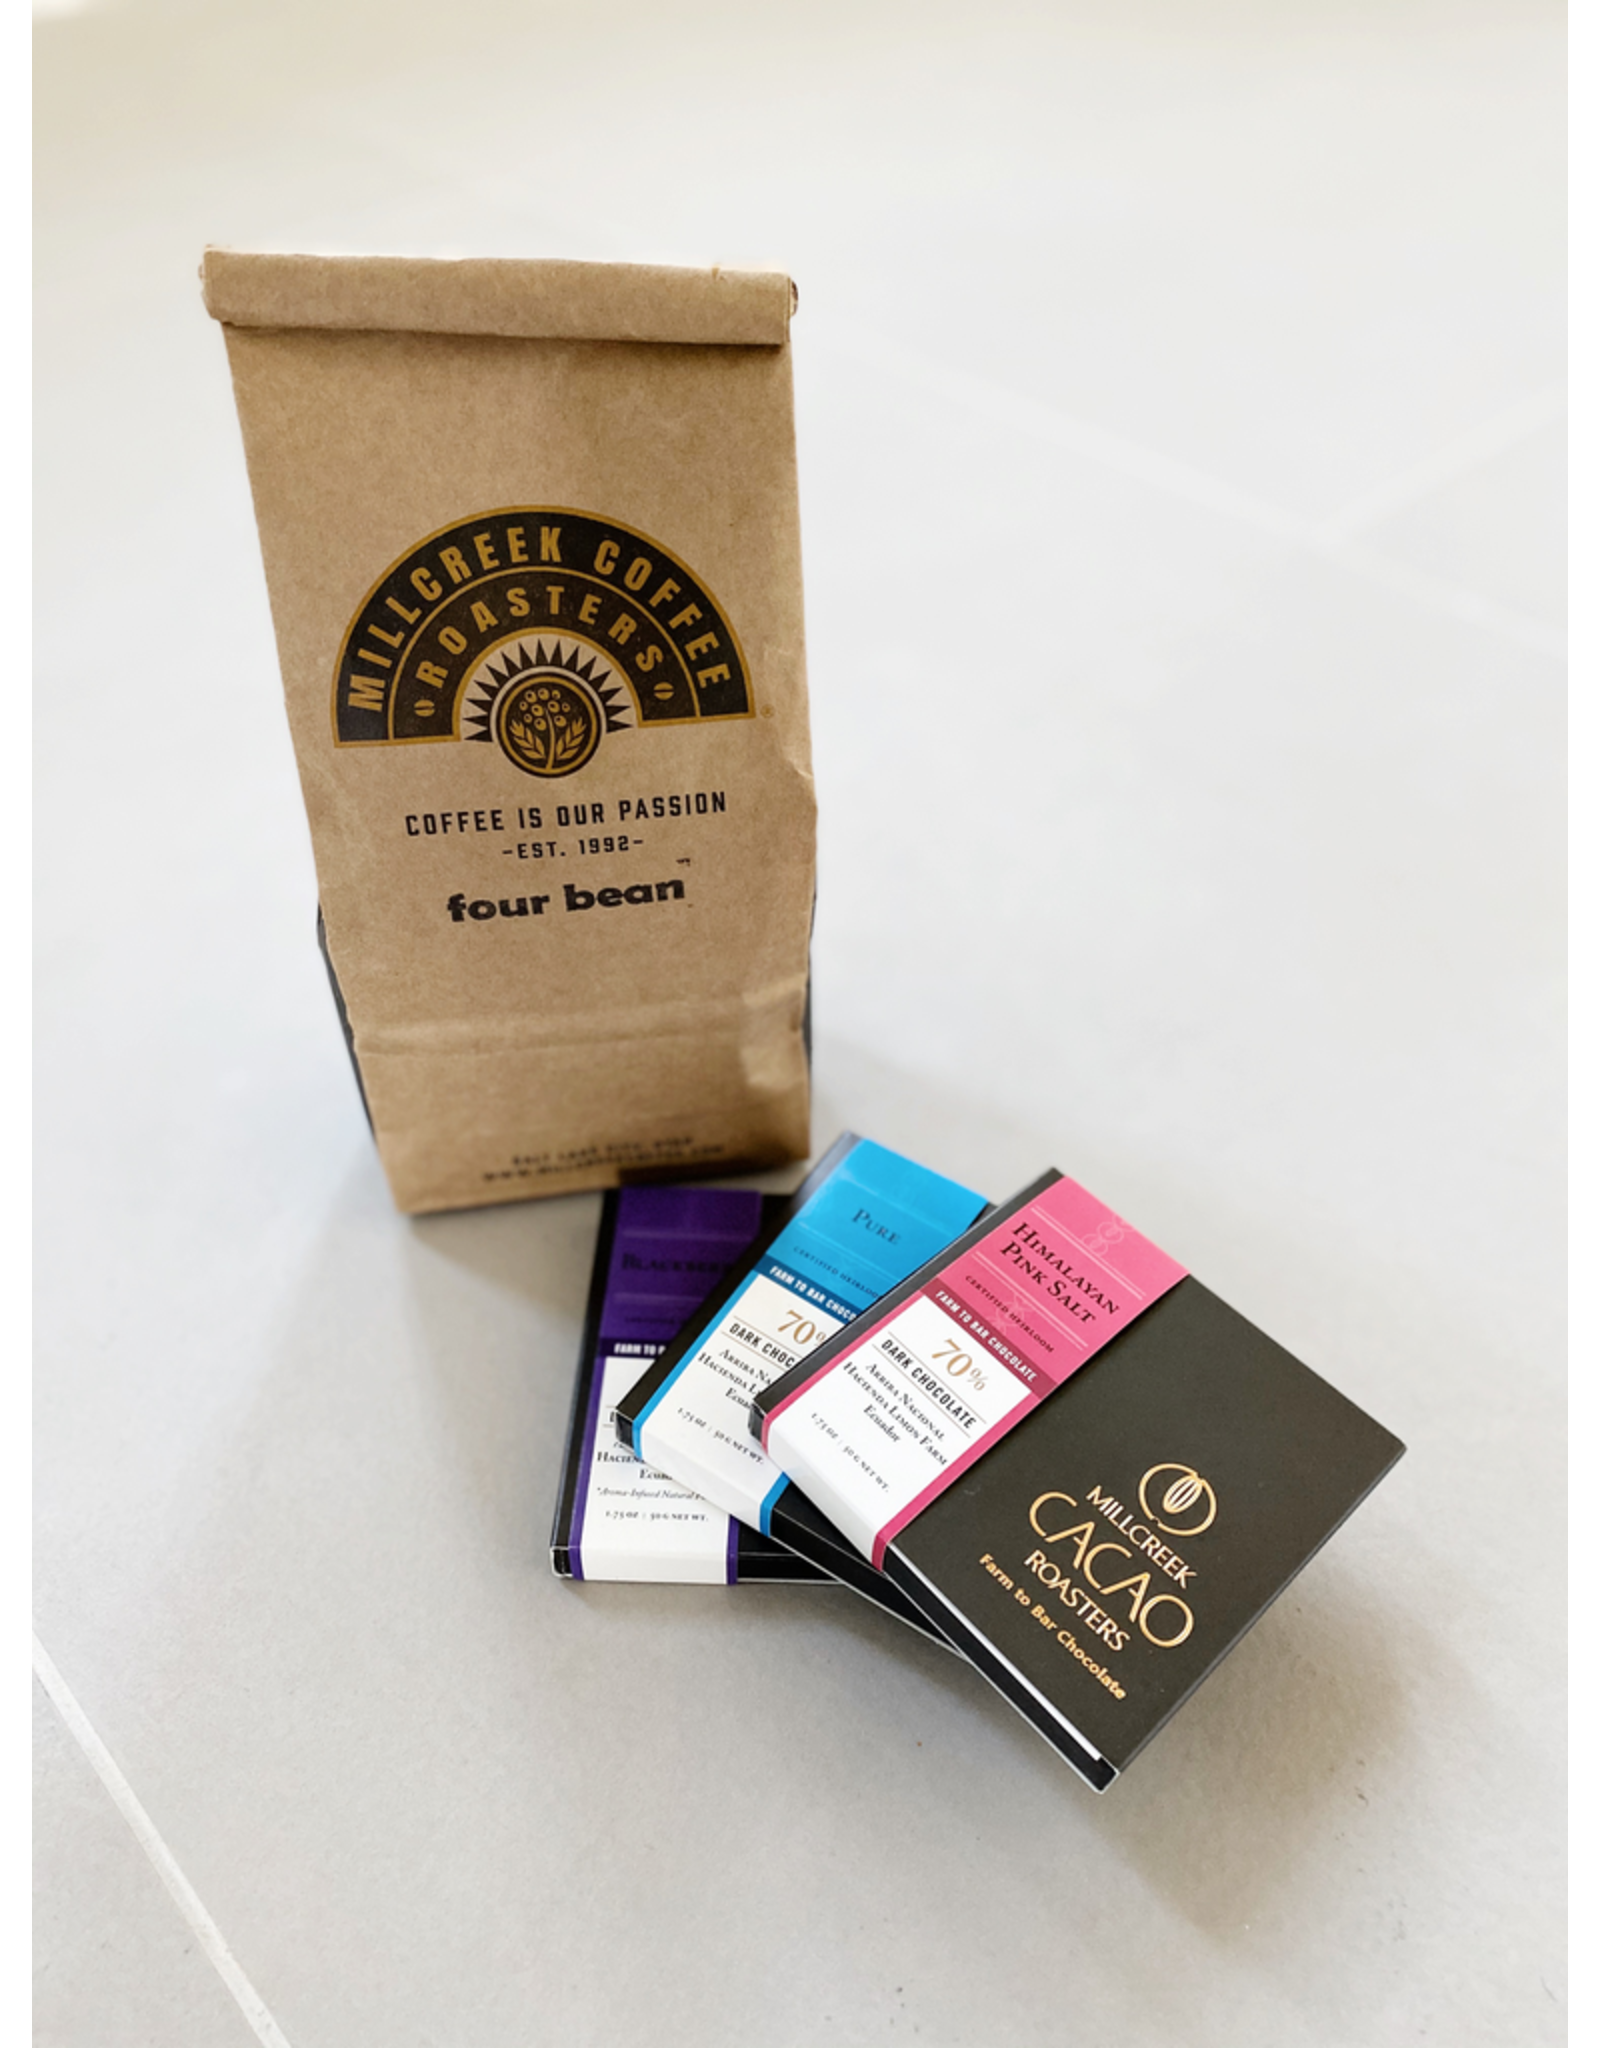 flight lux gift box!